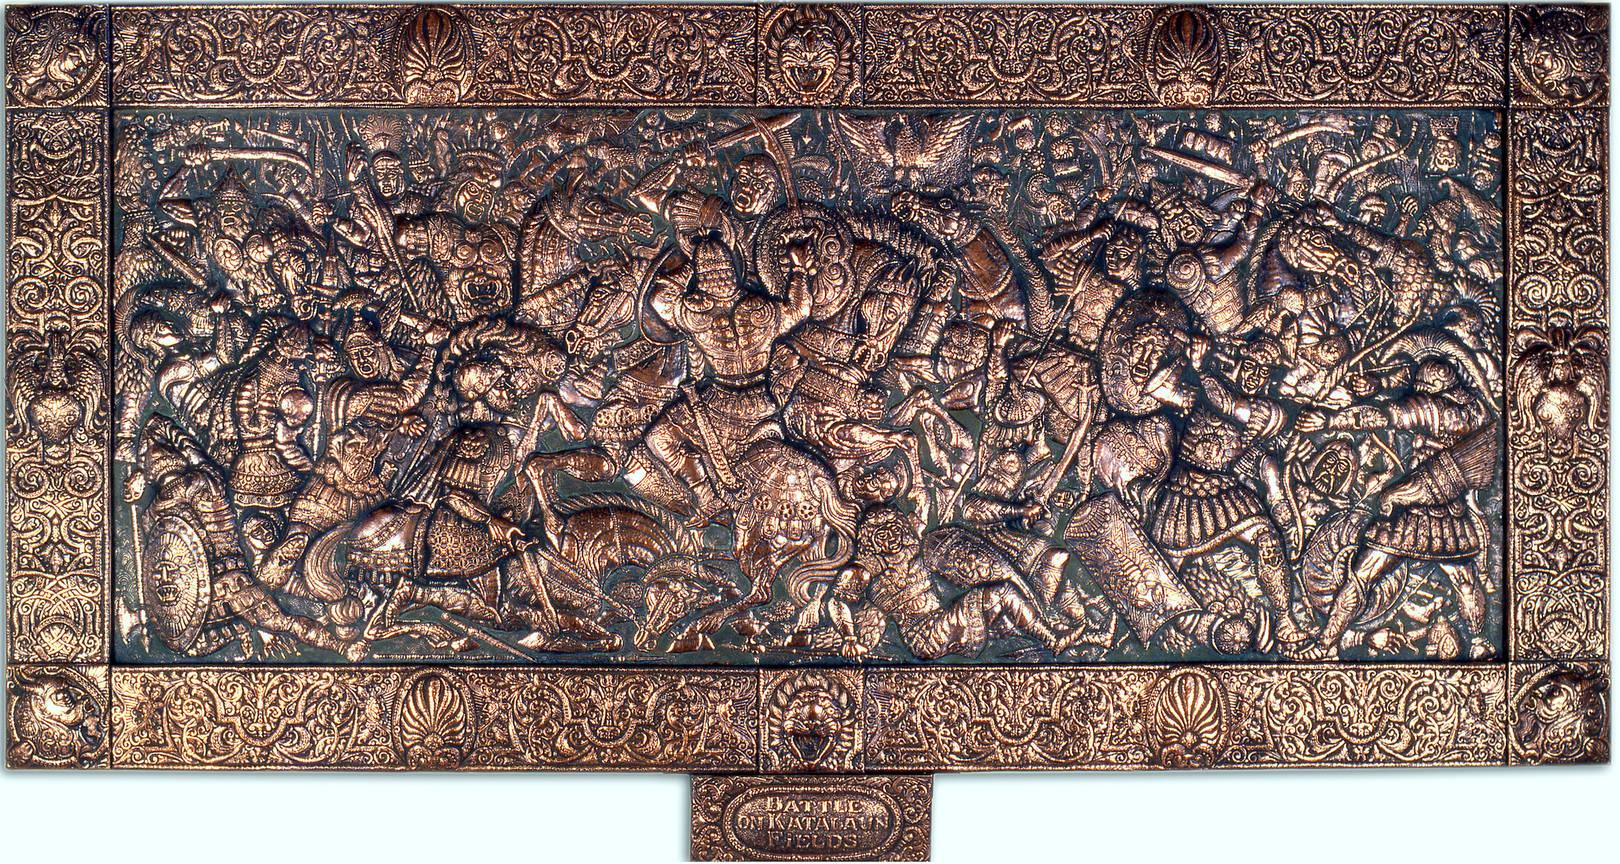 Битва на Каталаунских полях                                 (панно) 1992 г.                                                                                            Медь; чернение. 96 х176 см